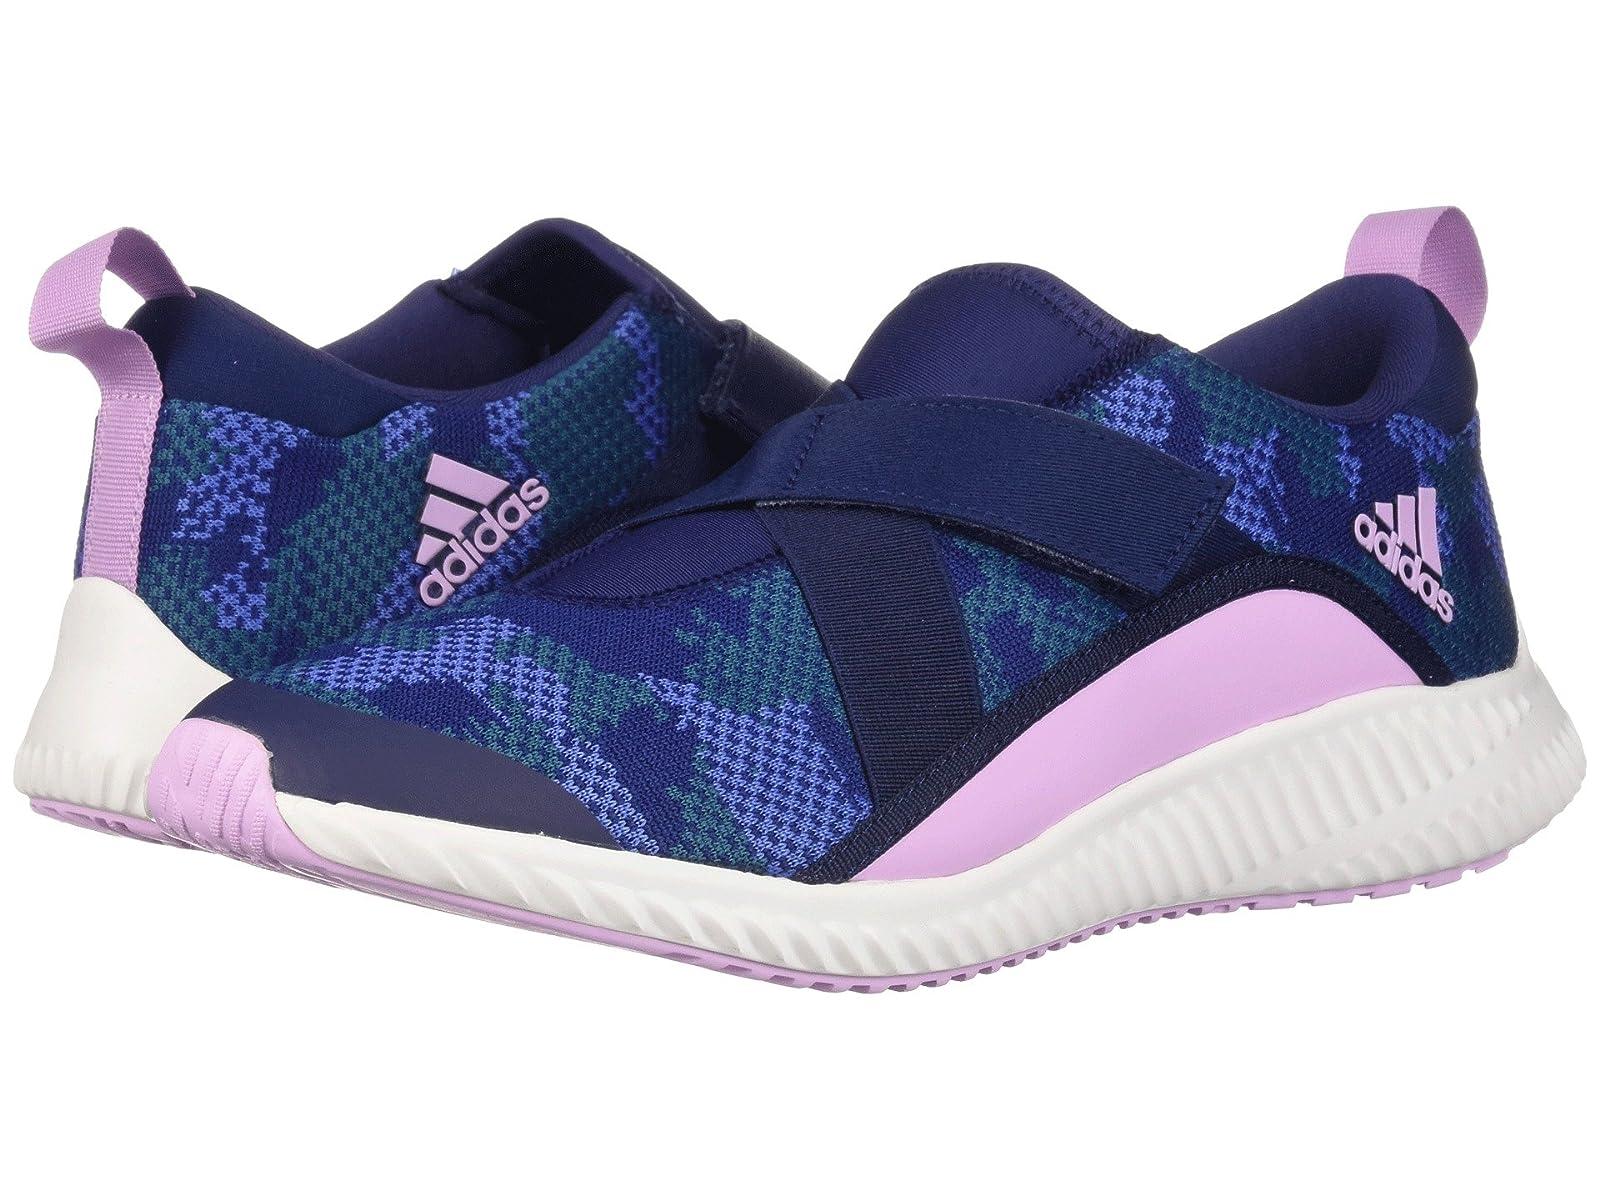 adidas Kids FortaRun X CF (Little Kid/Big Kid)Atmospheric grades have affordable shoes